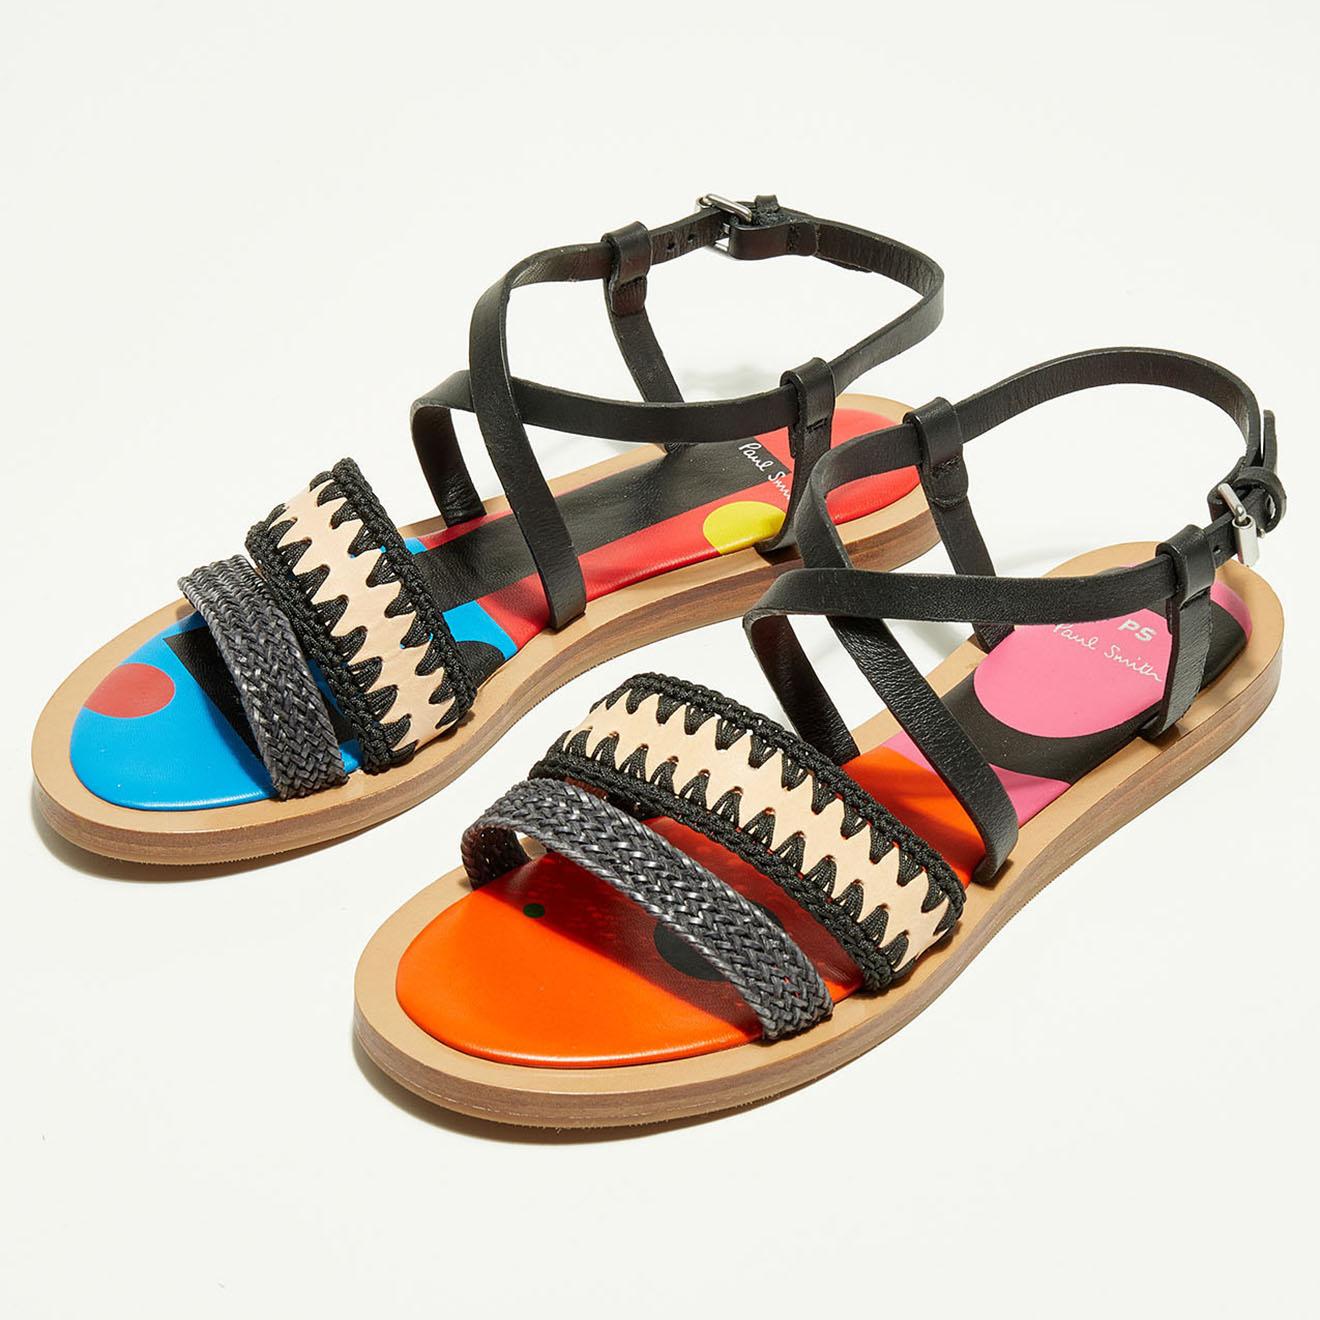 Sandales en Cuir Eunice noir/multicolore - Paul Smith - Modalova